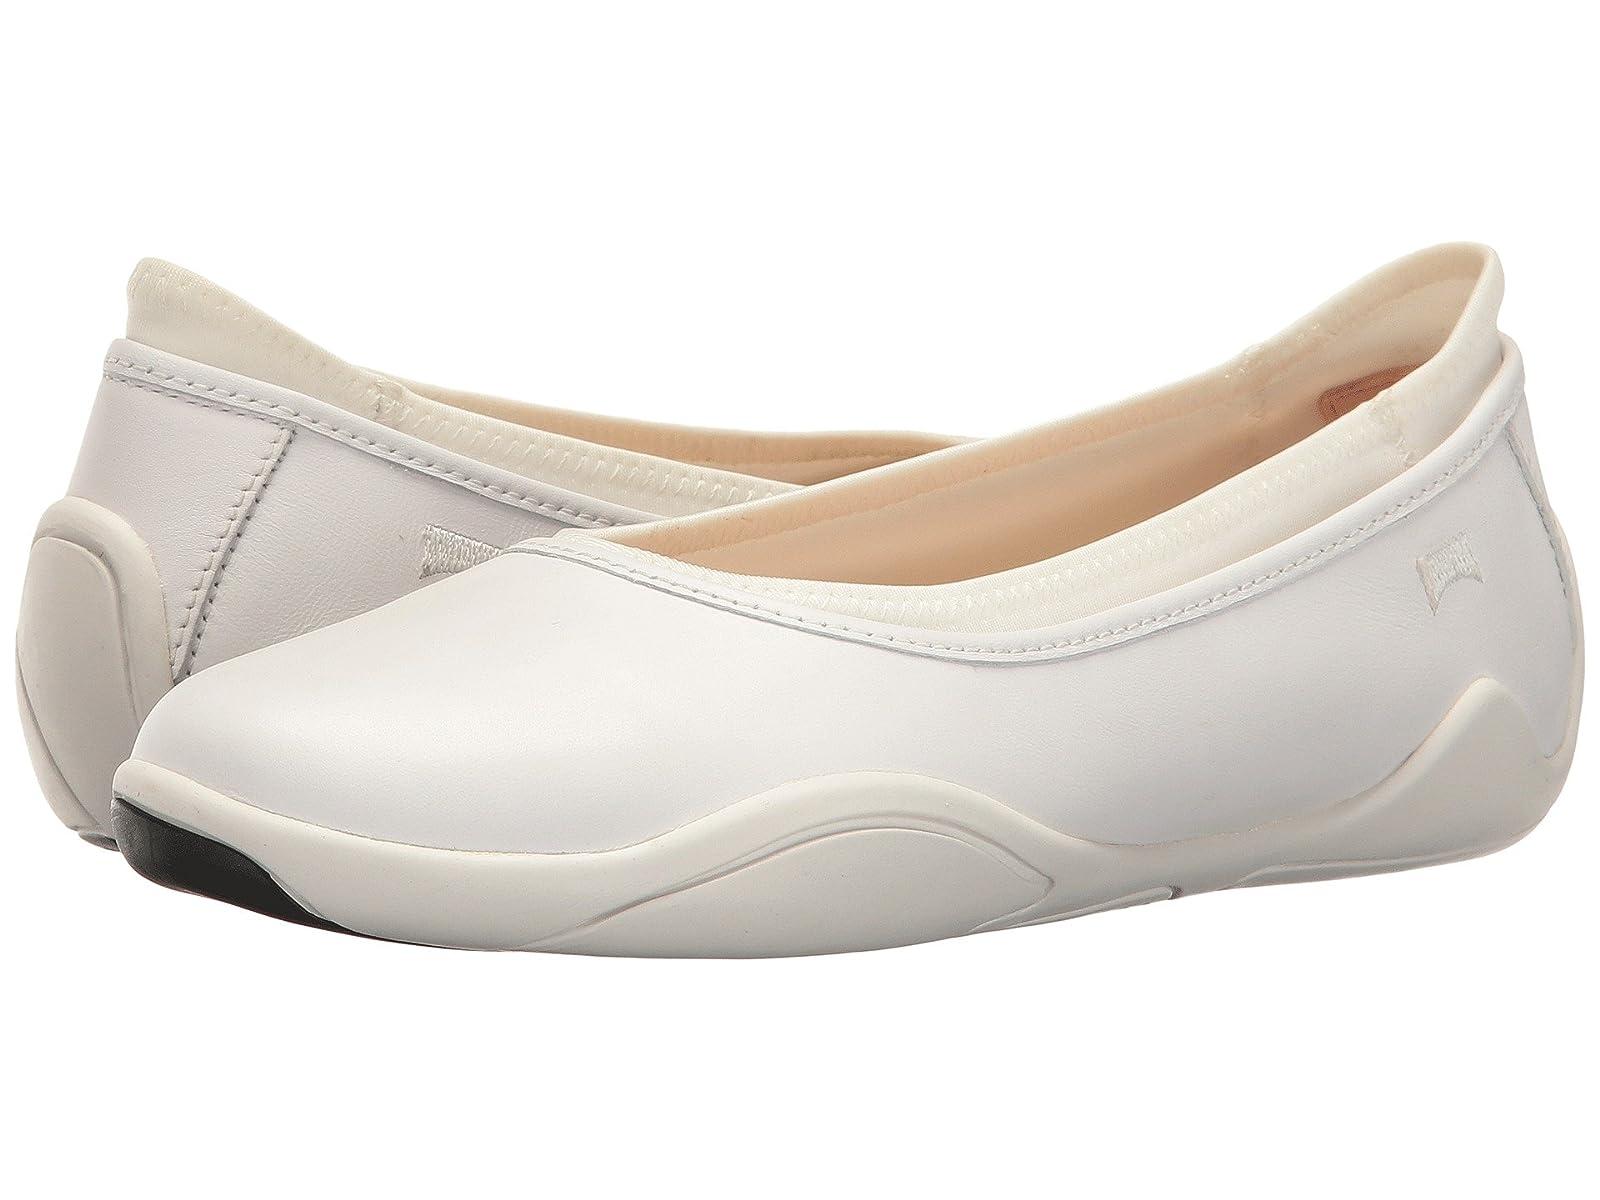 Camper Noshu - K200451Cheap and distinctive eye-catching shoes